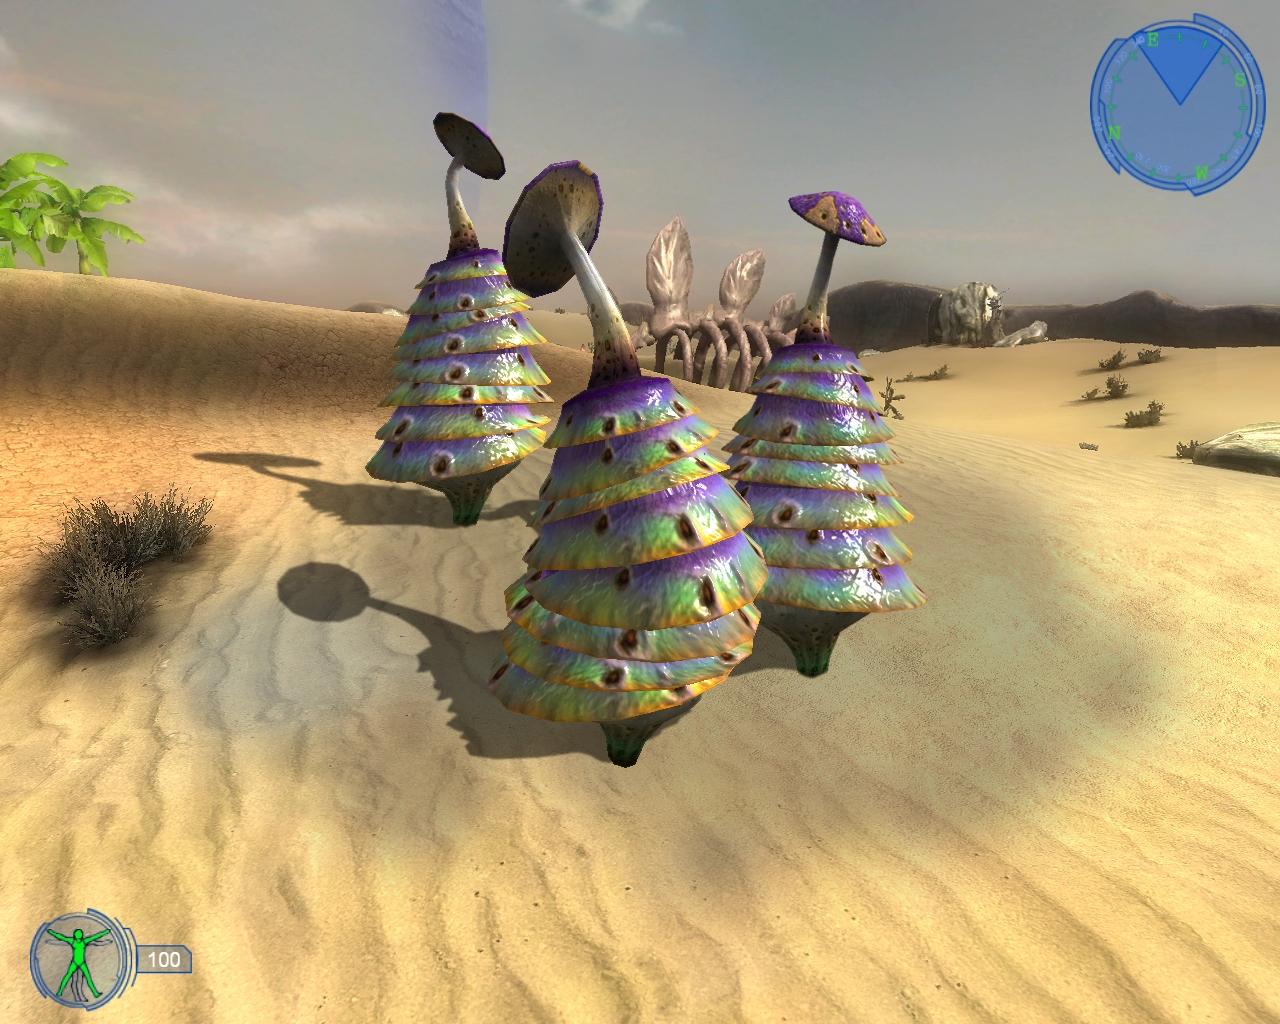 http://www.elite-games.ru/images/precursors/beast_dangflower.jpg